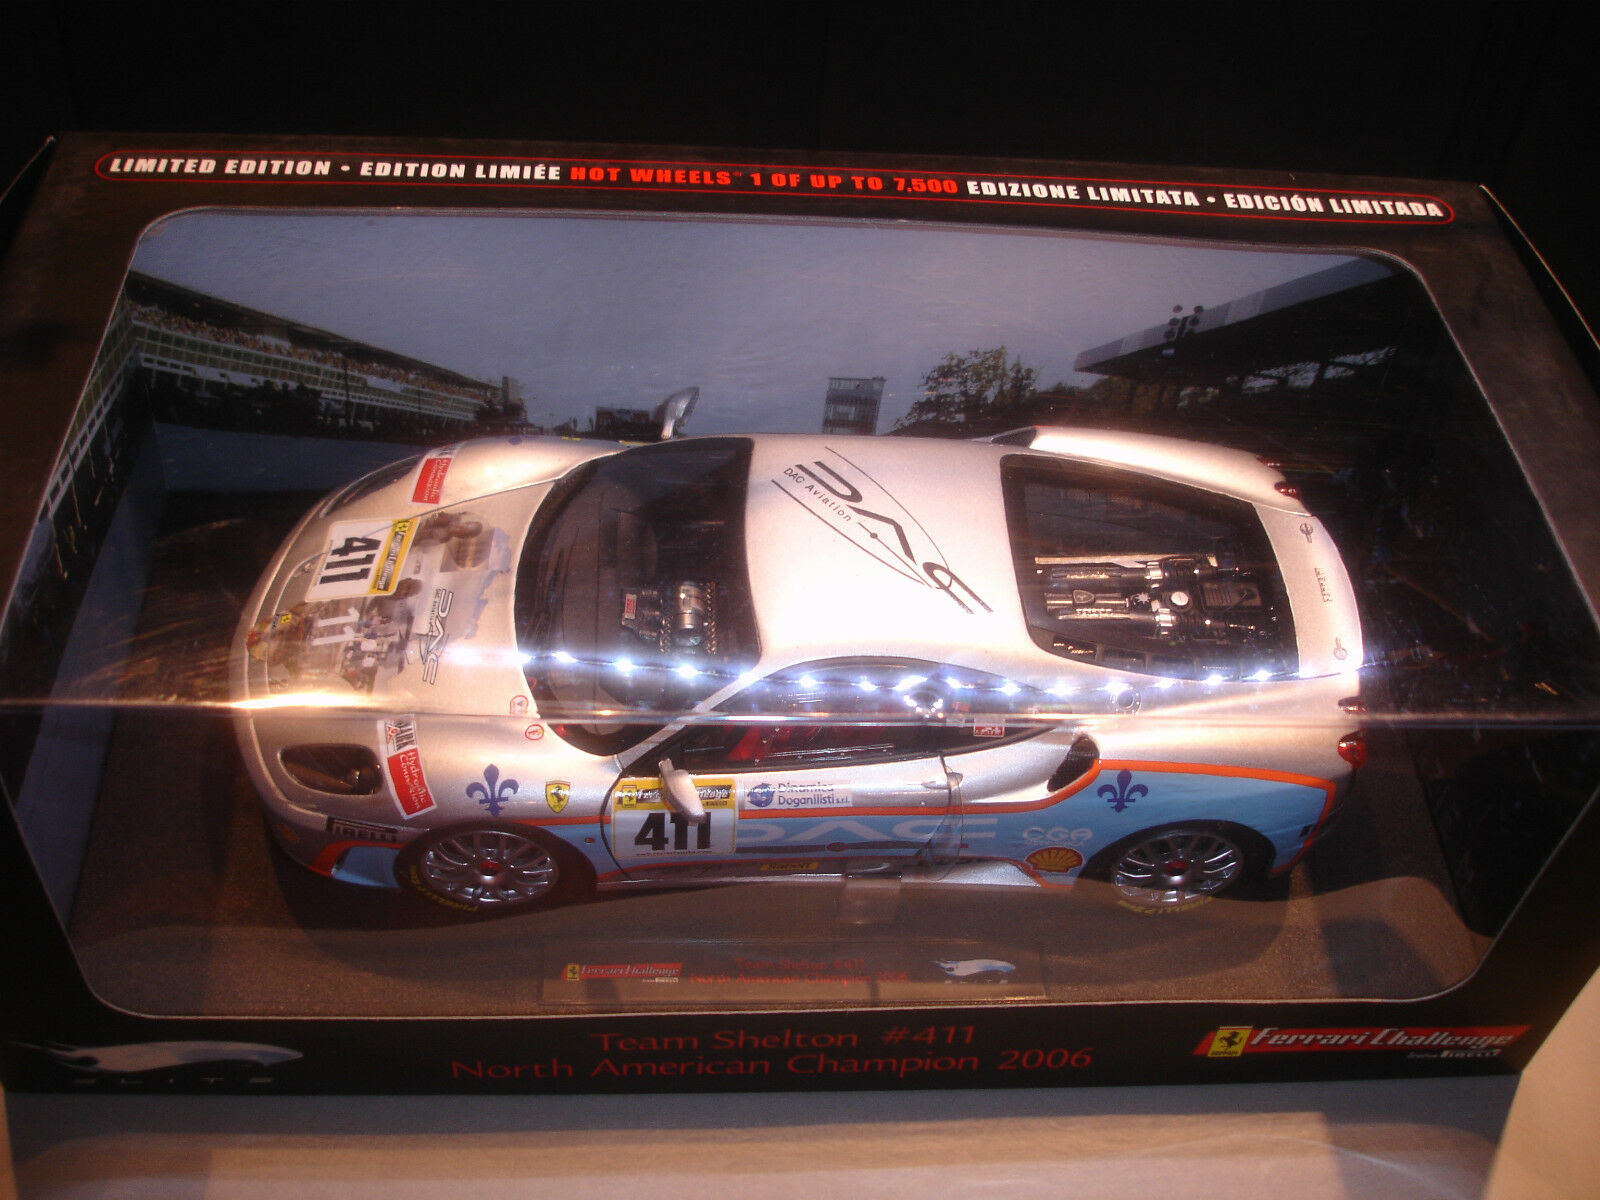 Ferrari f430 team shelton north american champion 2006 hot wheels elite 1   18.